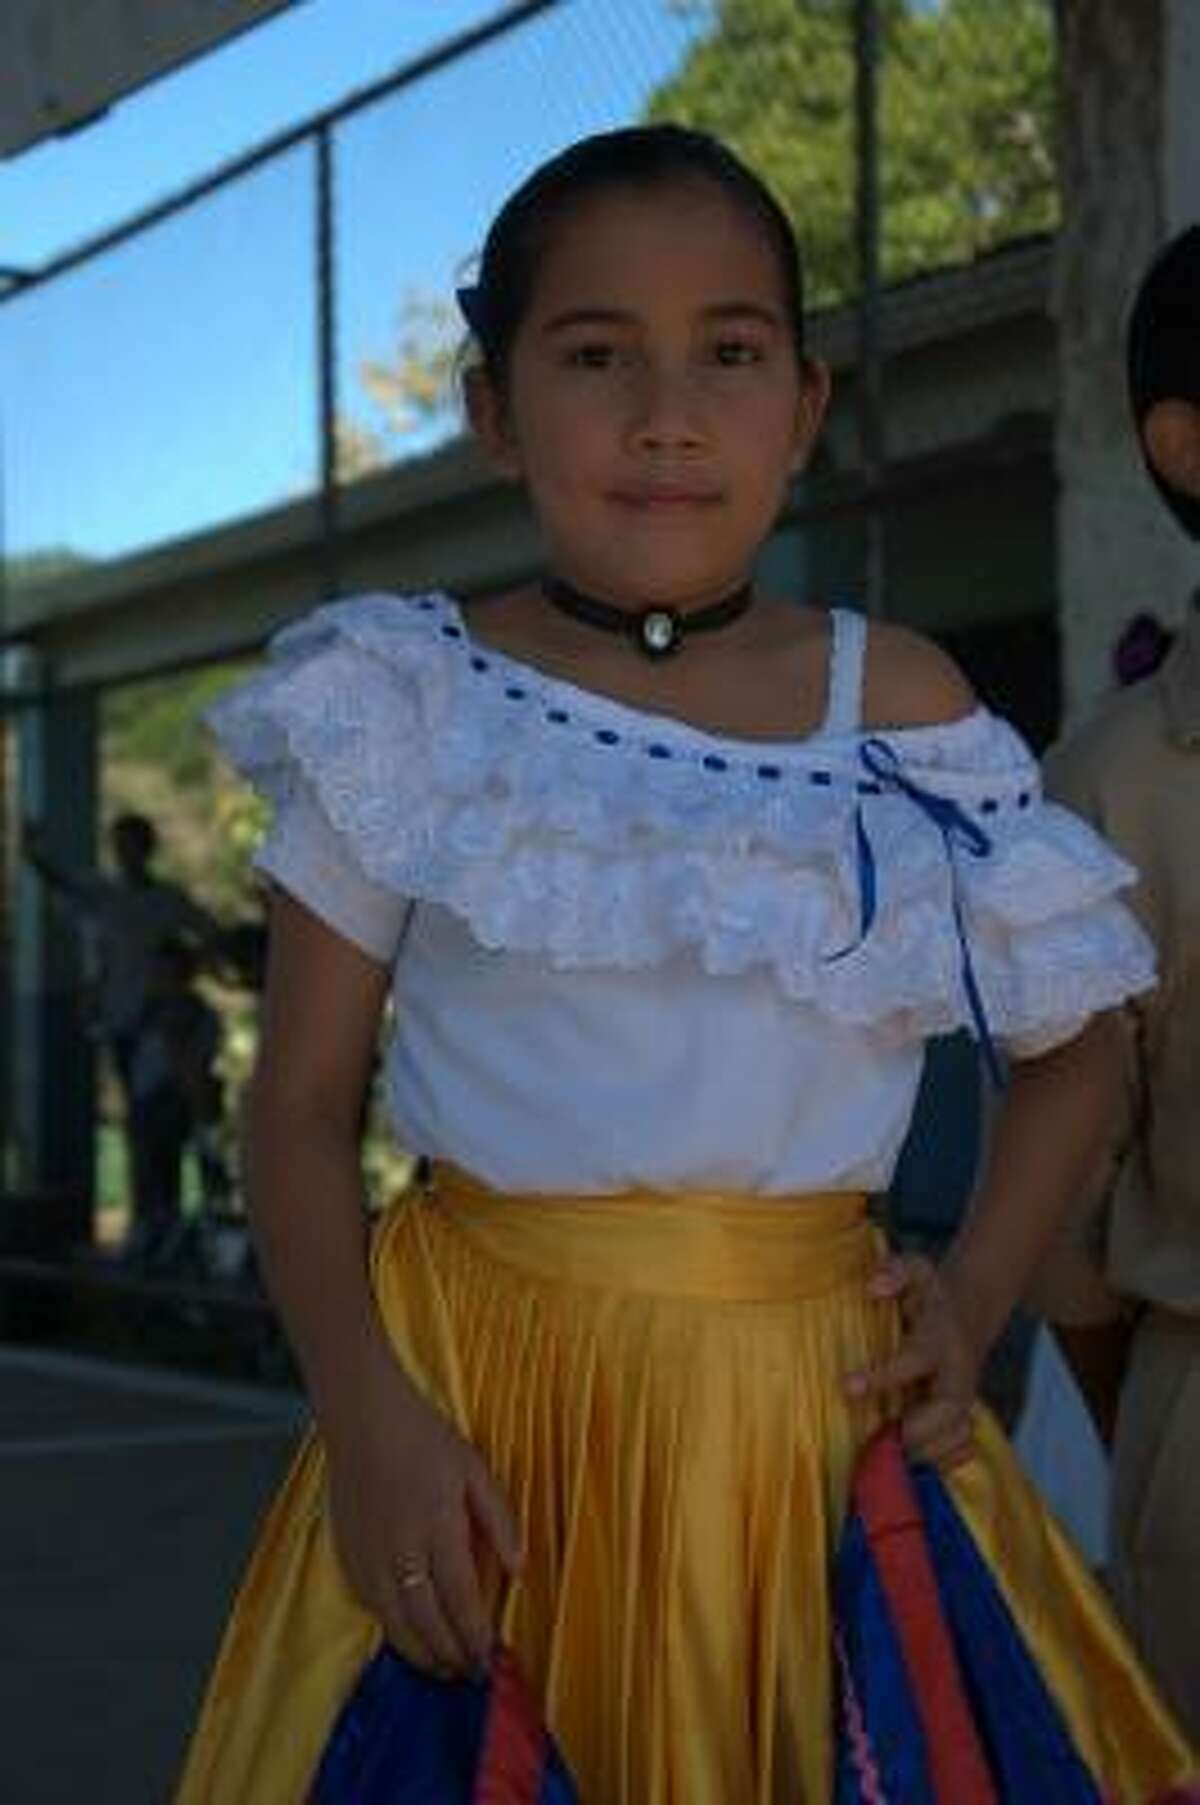 Maria Jose, 10, dances for visitors to her school in Costa Rica.